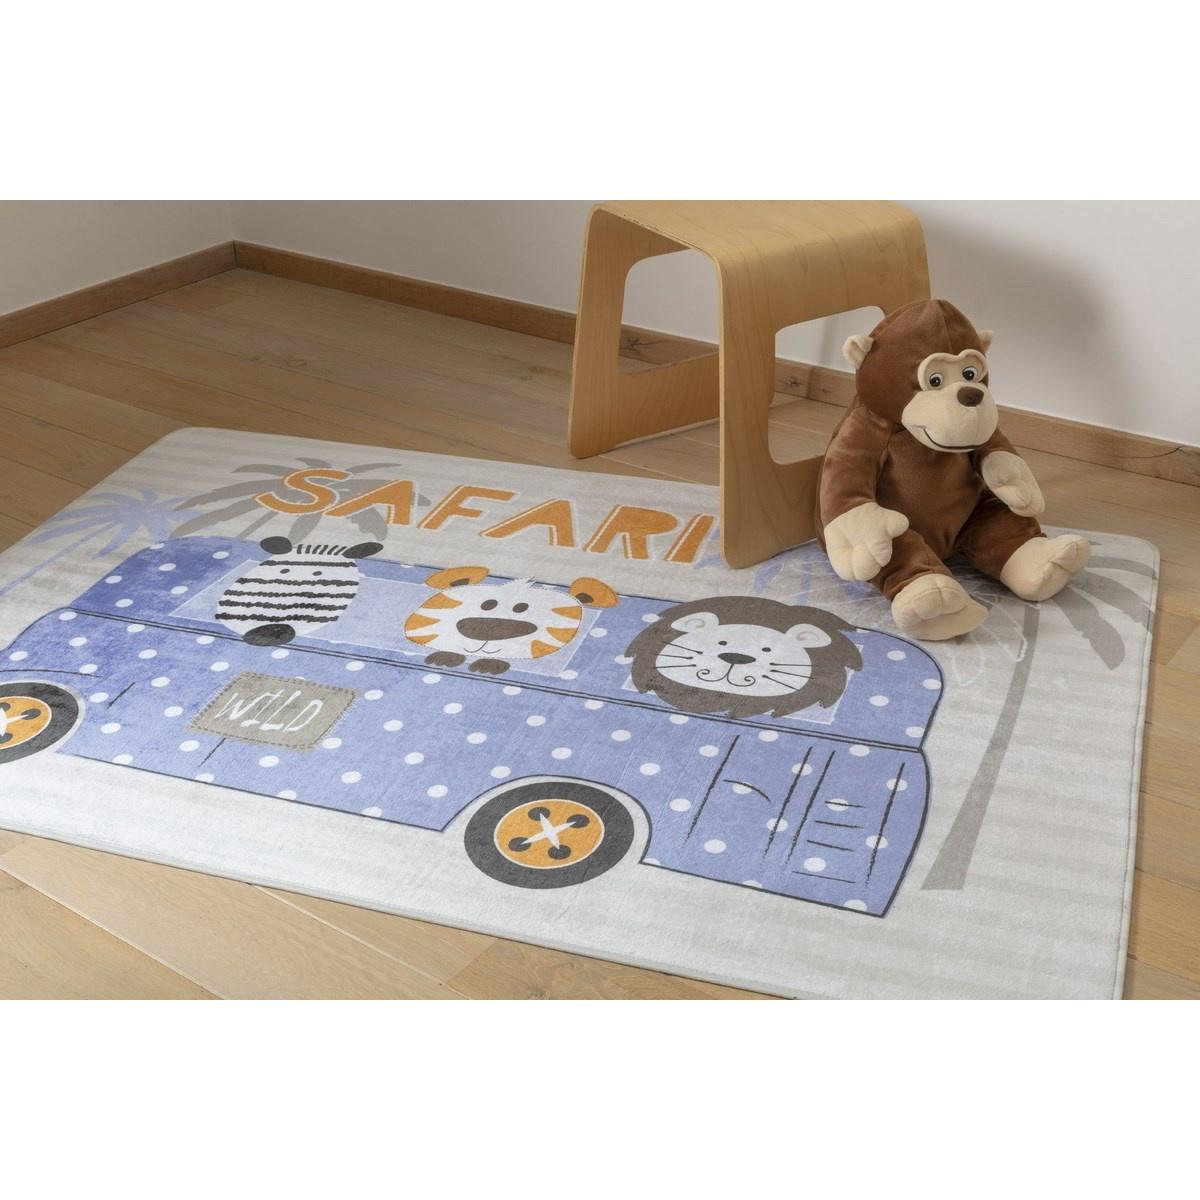 Vopi Dětský koberec Ultra Soft Bus Safari, 90 x 130 cm